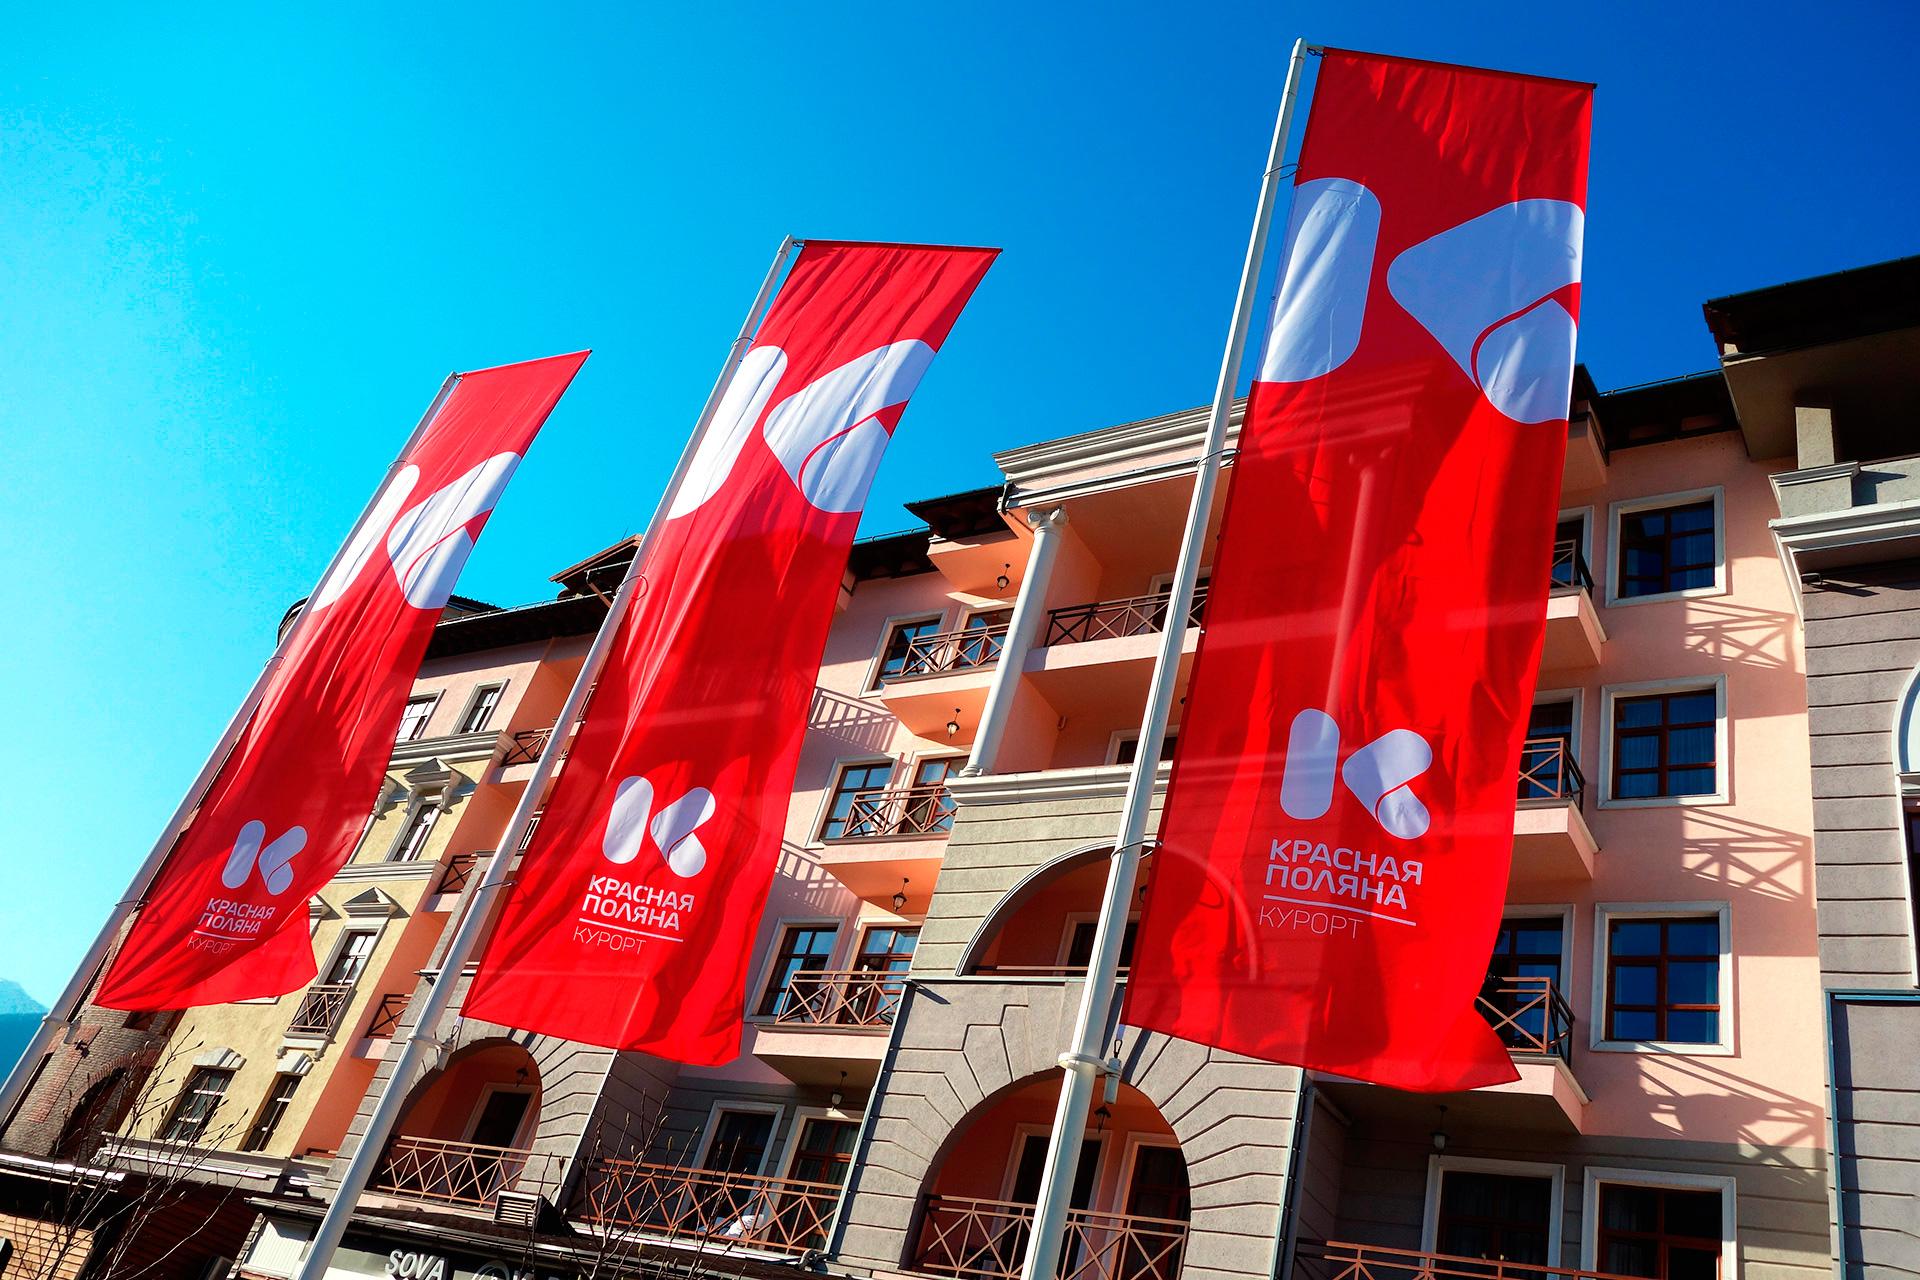 Krasnaya Polyana resort, identity, система фирменного стиля, red logo, flag, красные флаги, дизайн флага, Asgard